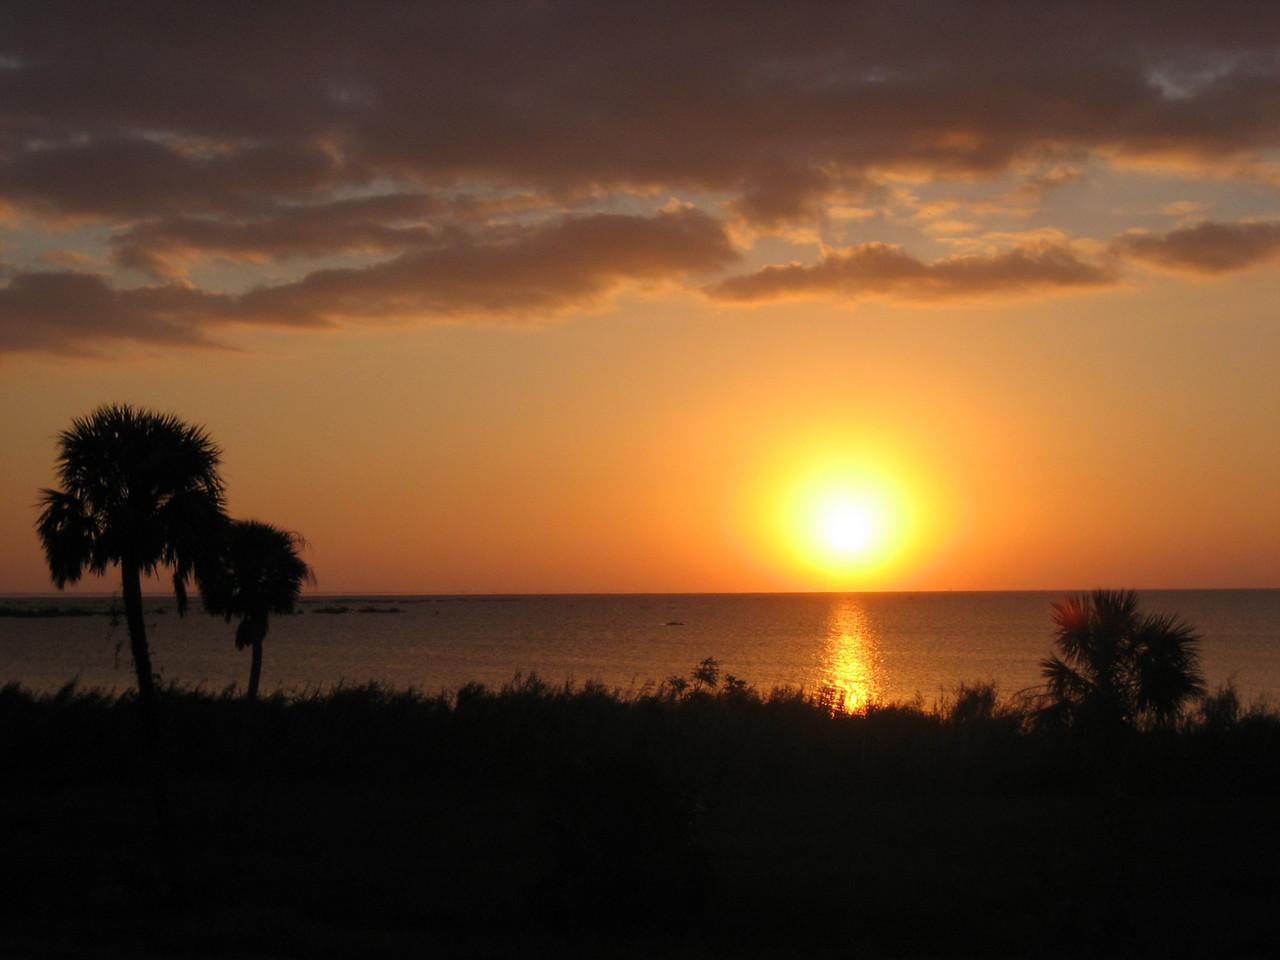 Sunrise over Lake Okeechobee<br /> PHOTO CREDIT: Sandra Friend / Florida Trail Association